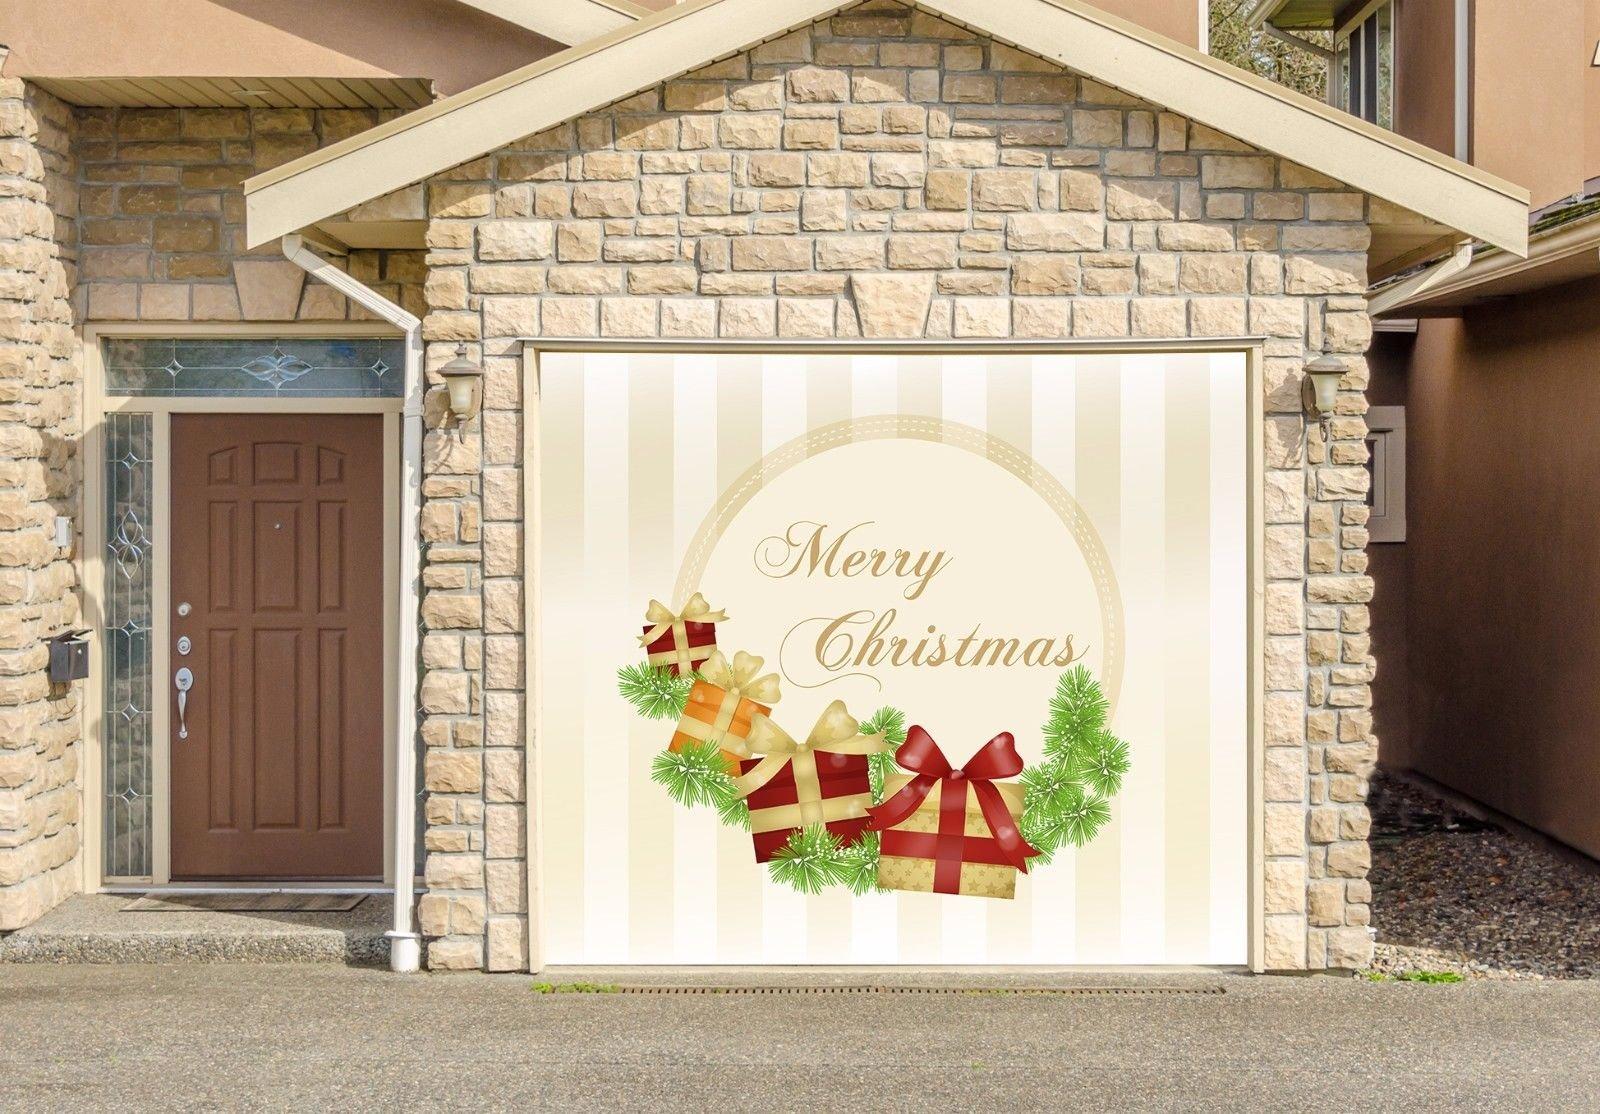 Buy Christmas Decor Banner Single Car Garage Door Murals Covers Outdoor Home Decor Door Cover Billboard Full Color 3d Effect Print Door Decor Decorations Of House Garage Holiday Size 83 X 96